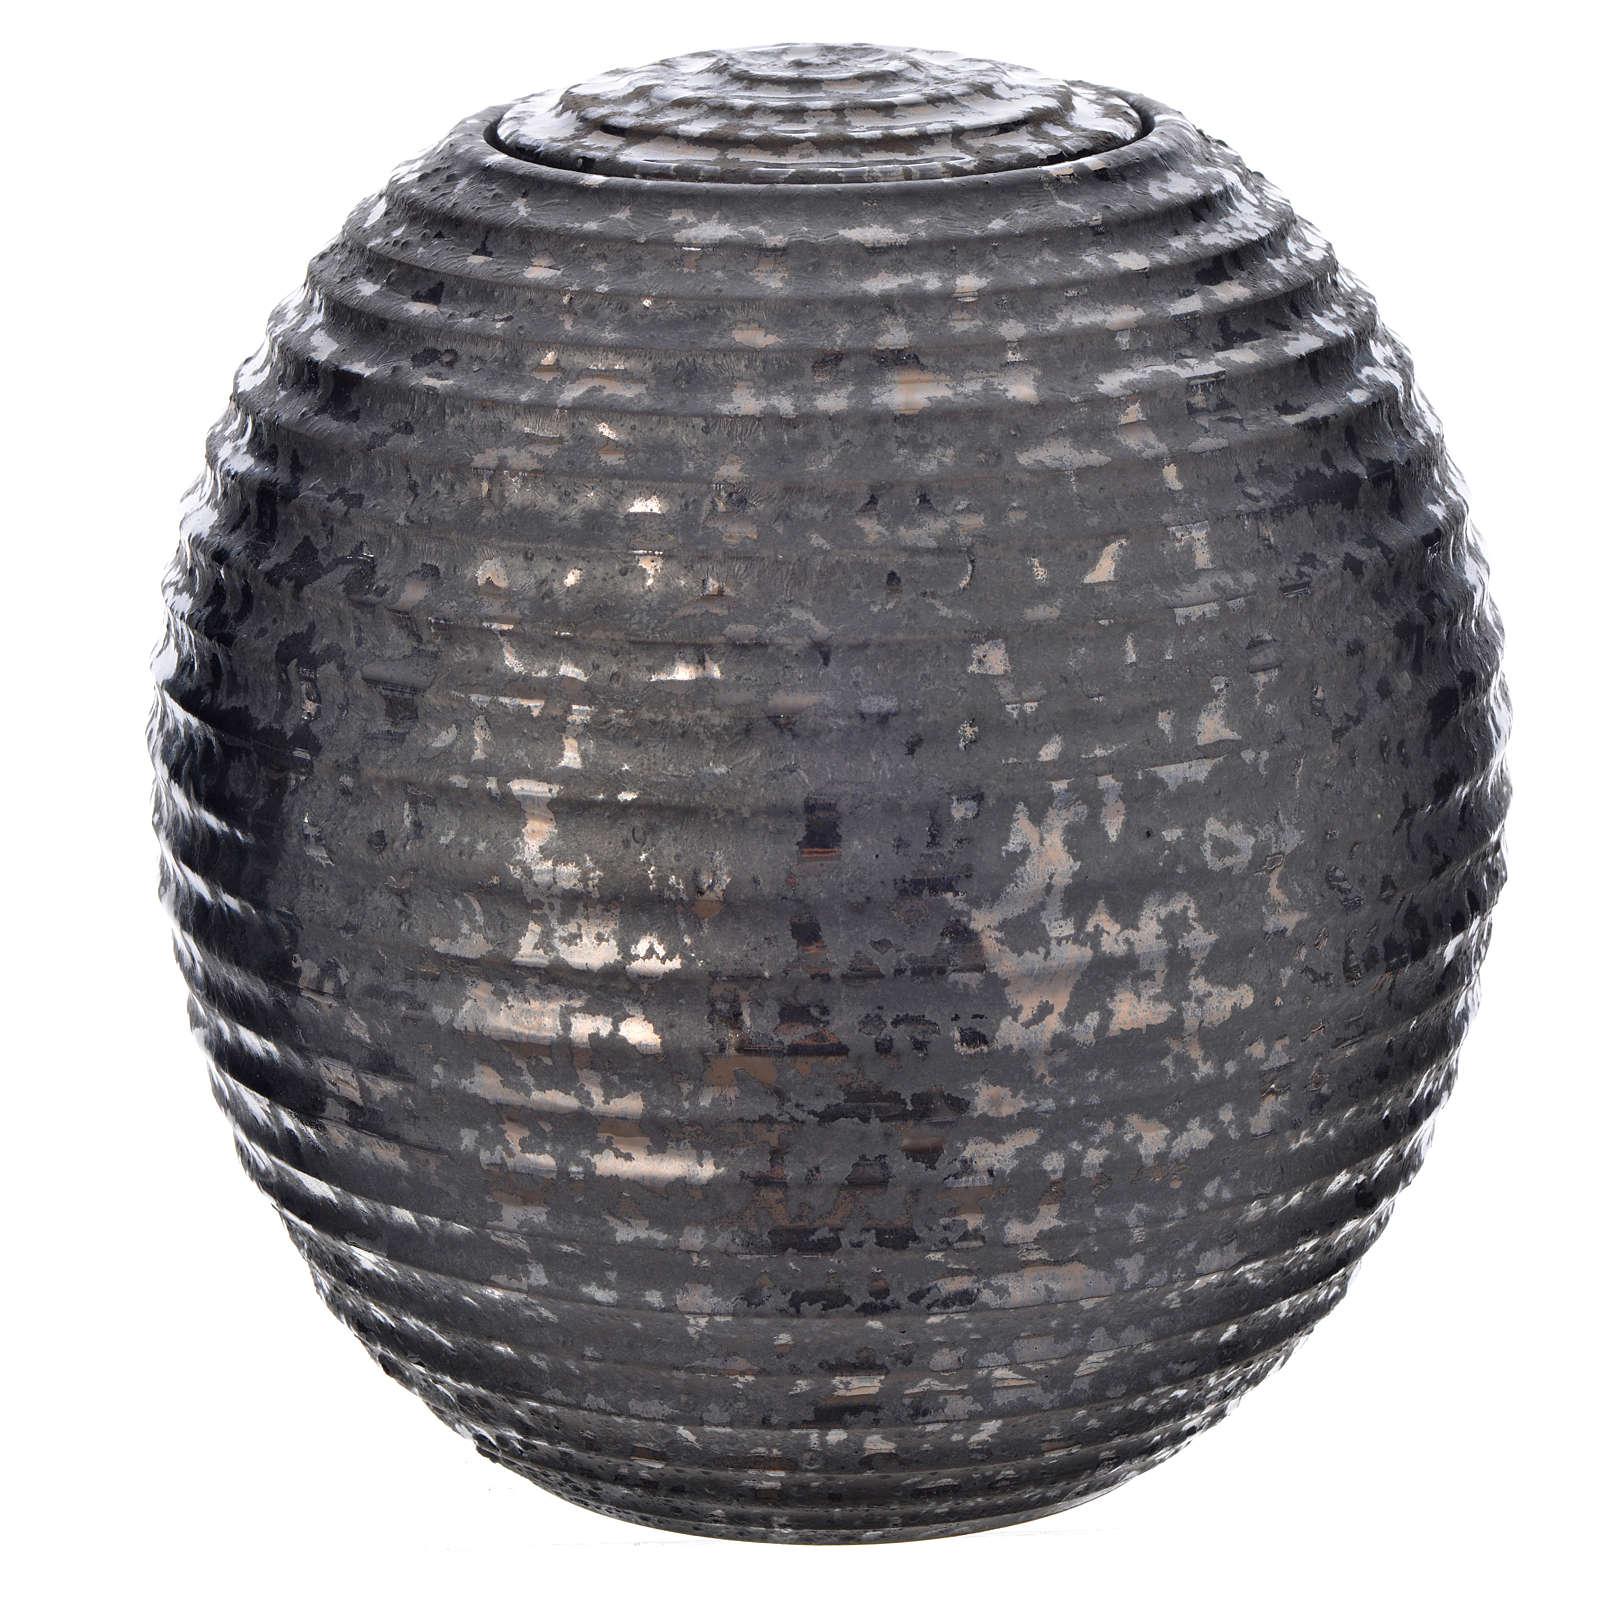 Urna cineraria porcelana esmaltada mod. Negro Tecno 3